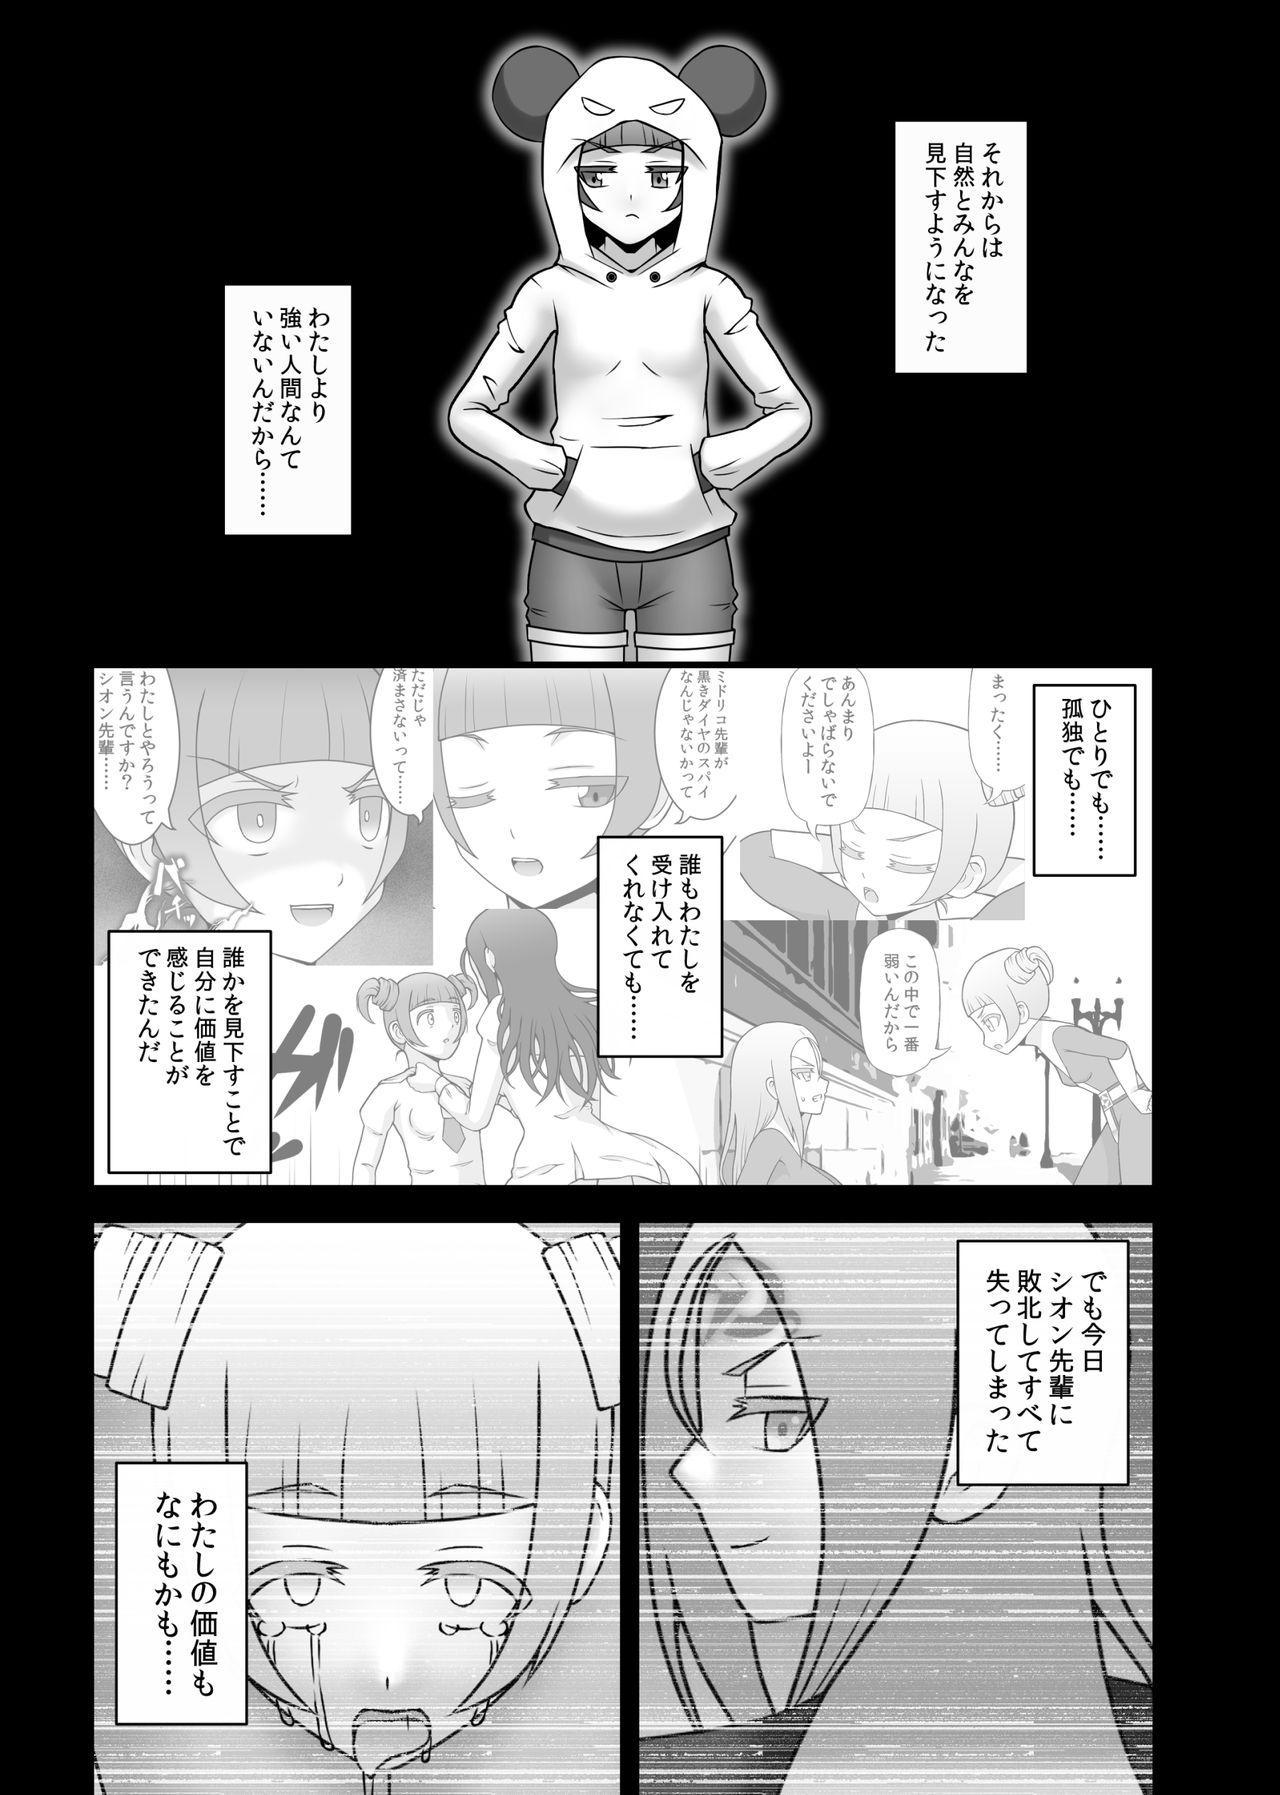 [STUDIO HP+ (IceLee)] Teisou Sentai Virginal Colors Dai-Go-wa 25